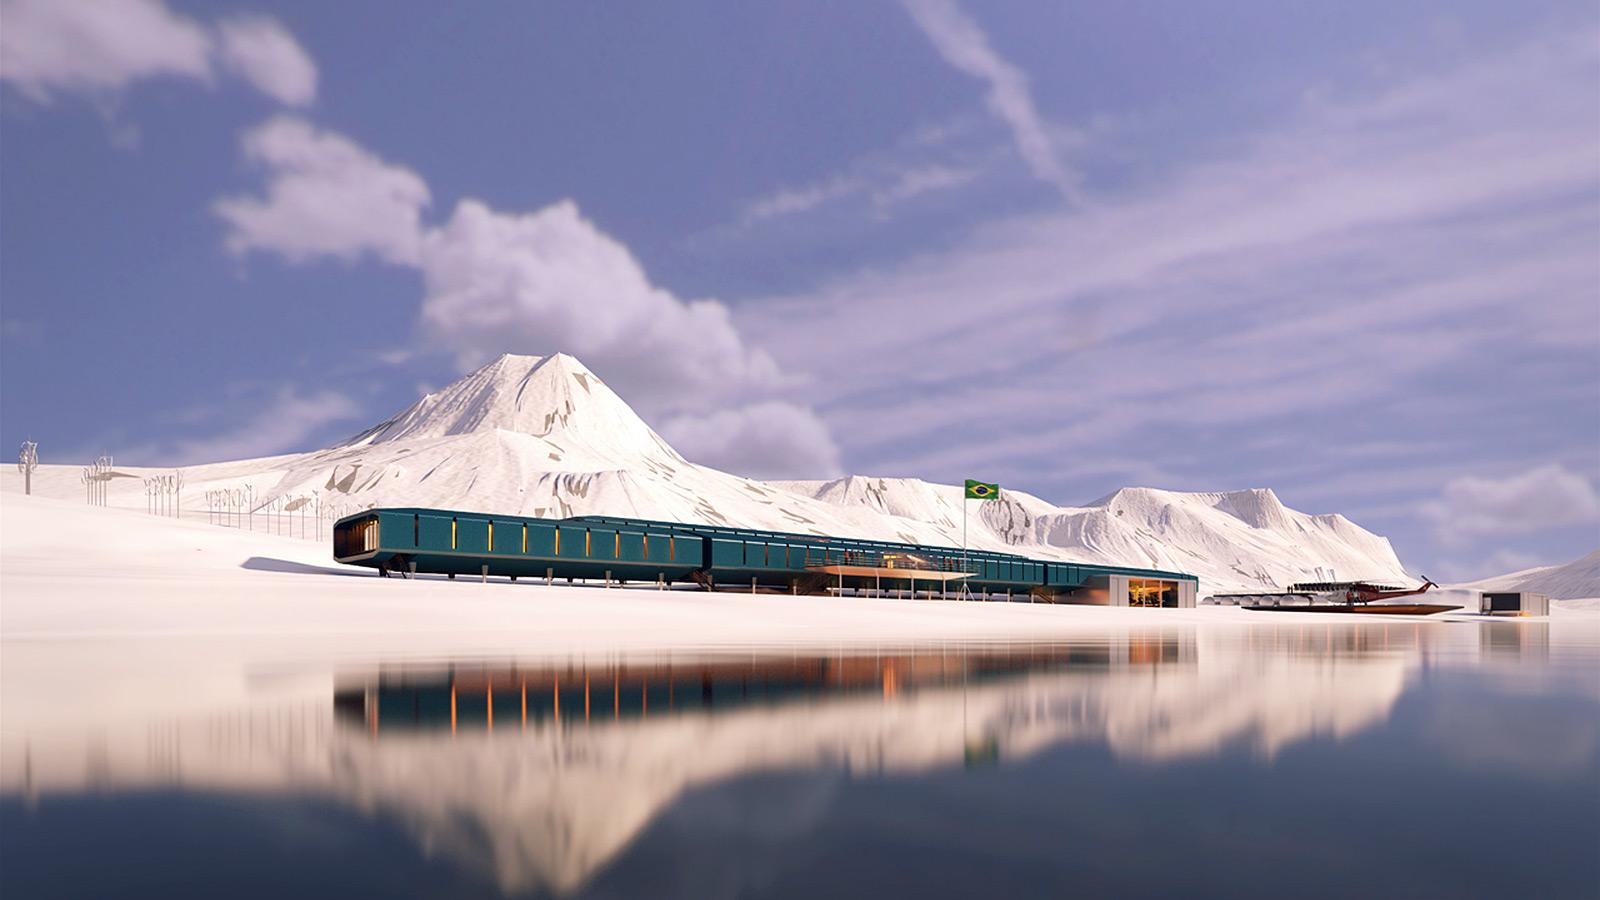 estudio-41-estacao-antarctica-ferraz-brazil-antarctic-research-station-view-mountains